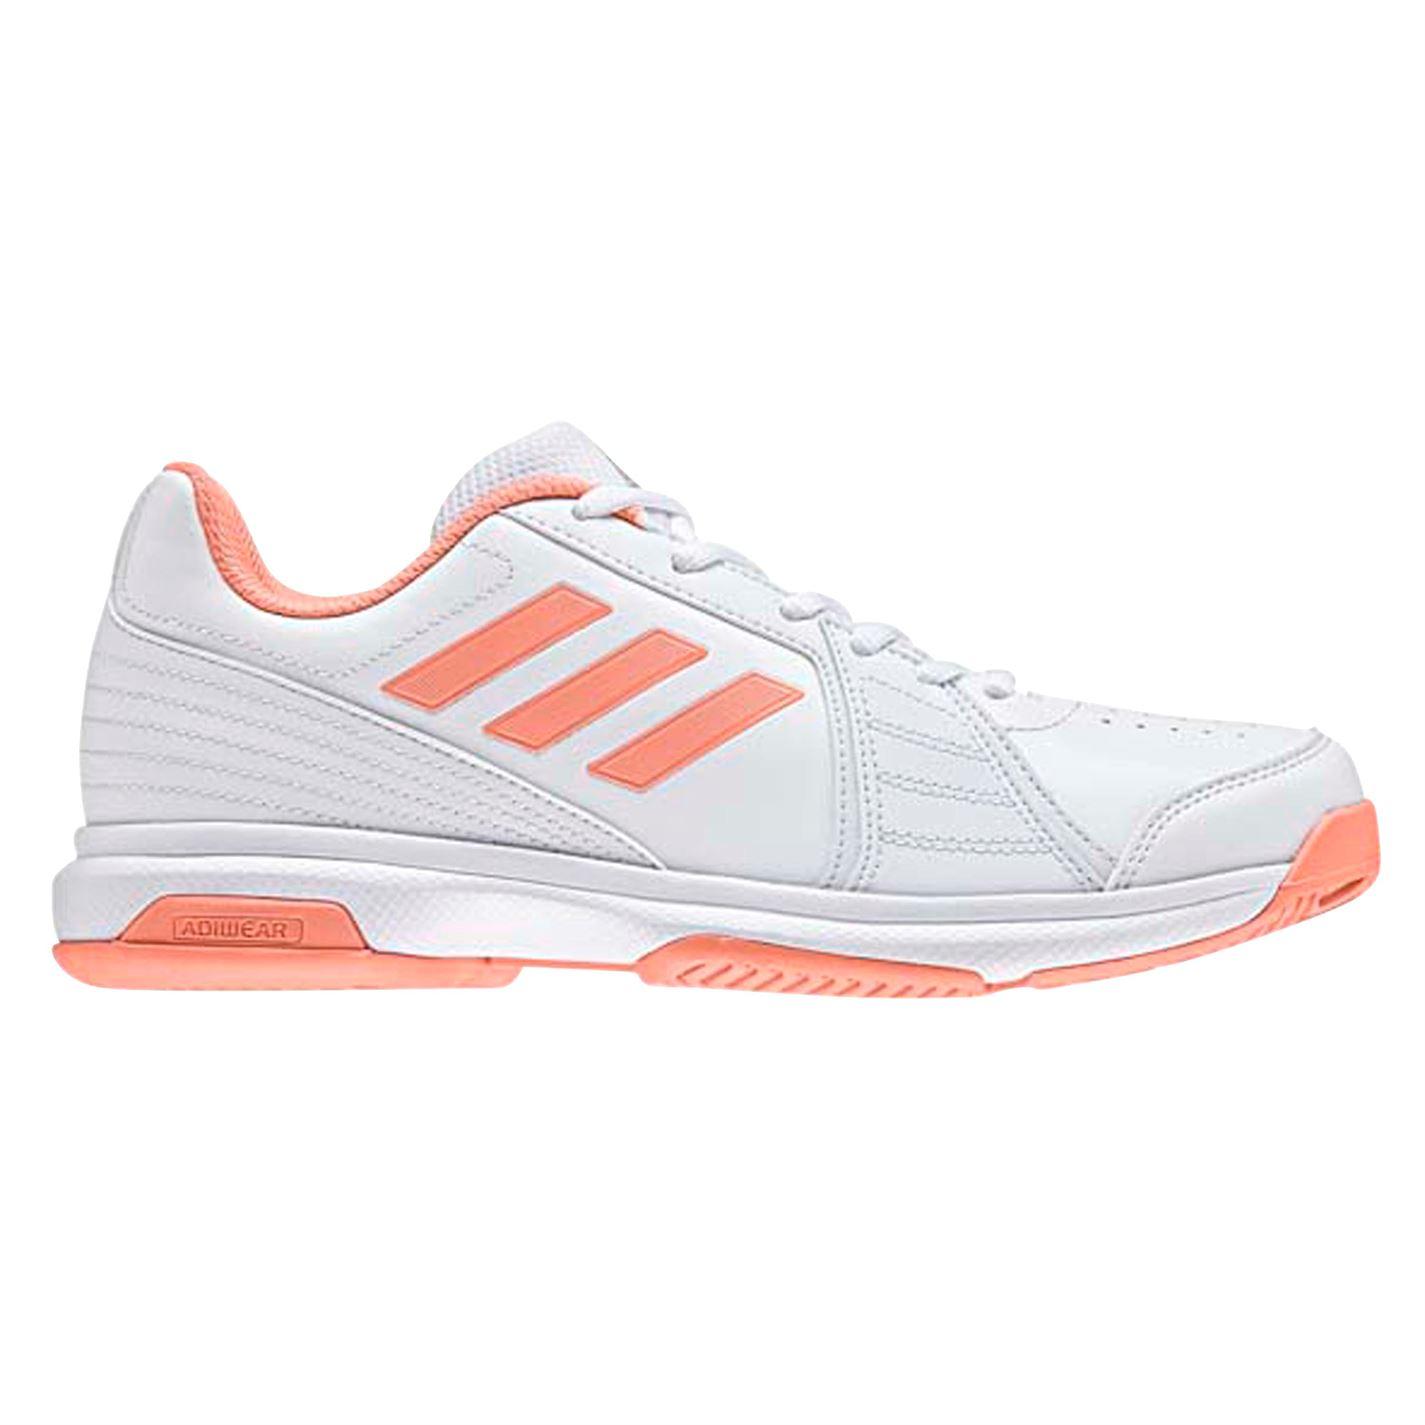 boty adidas Aspire dámské Tennis Shoes